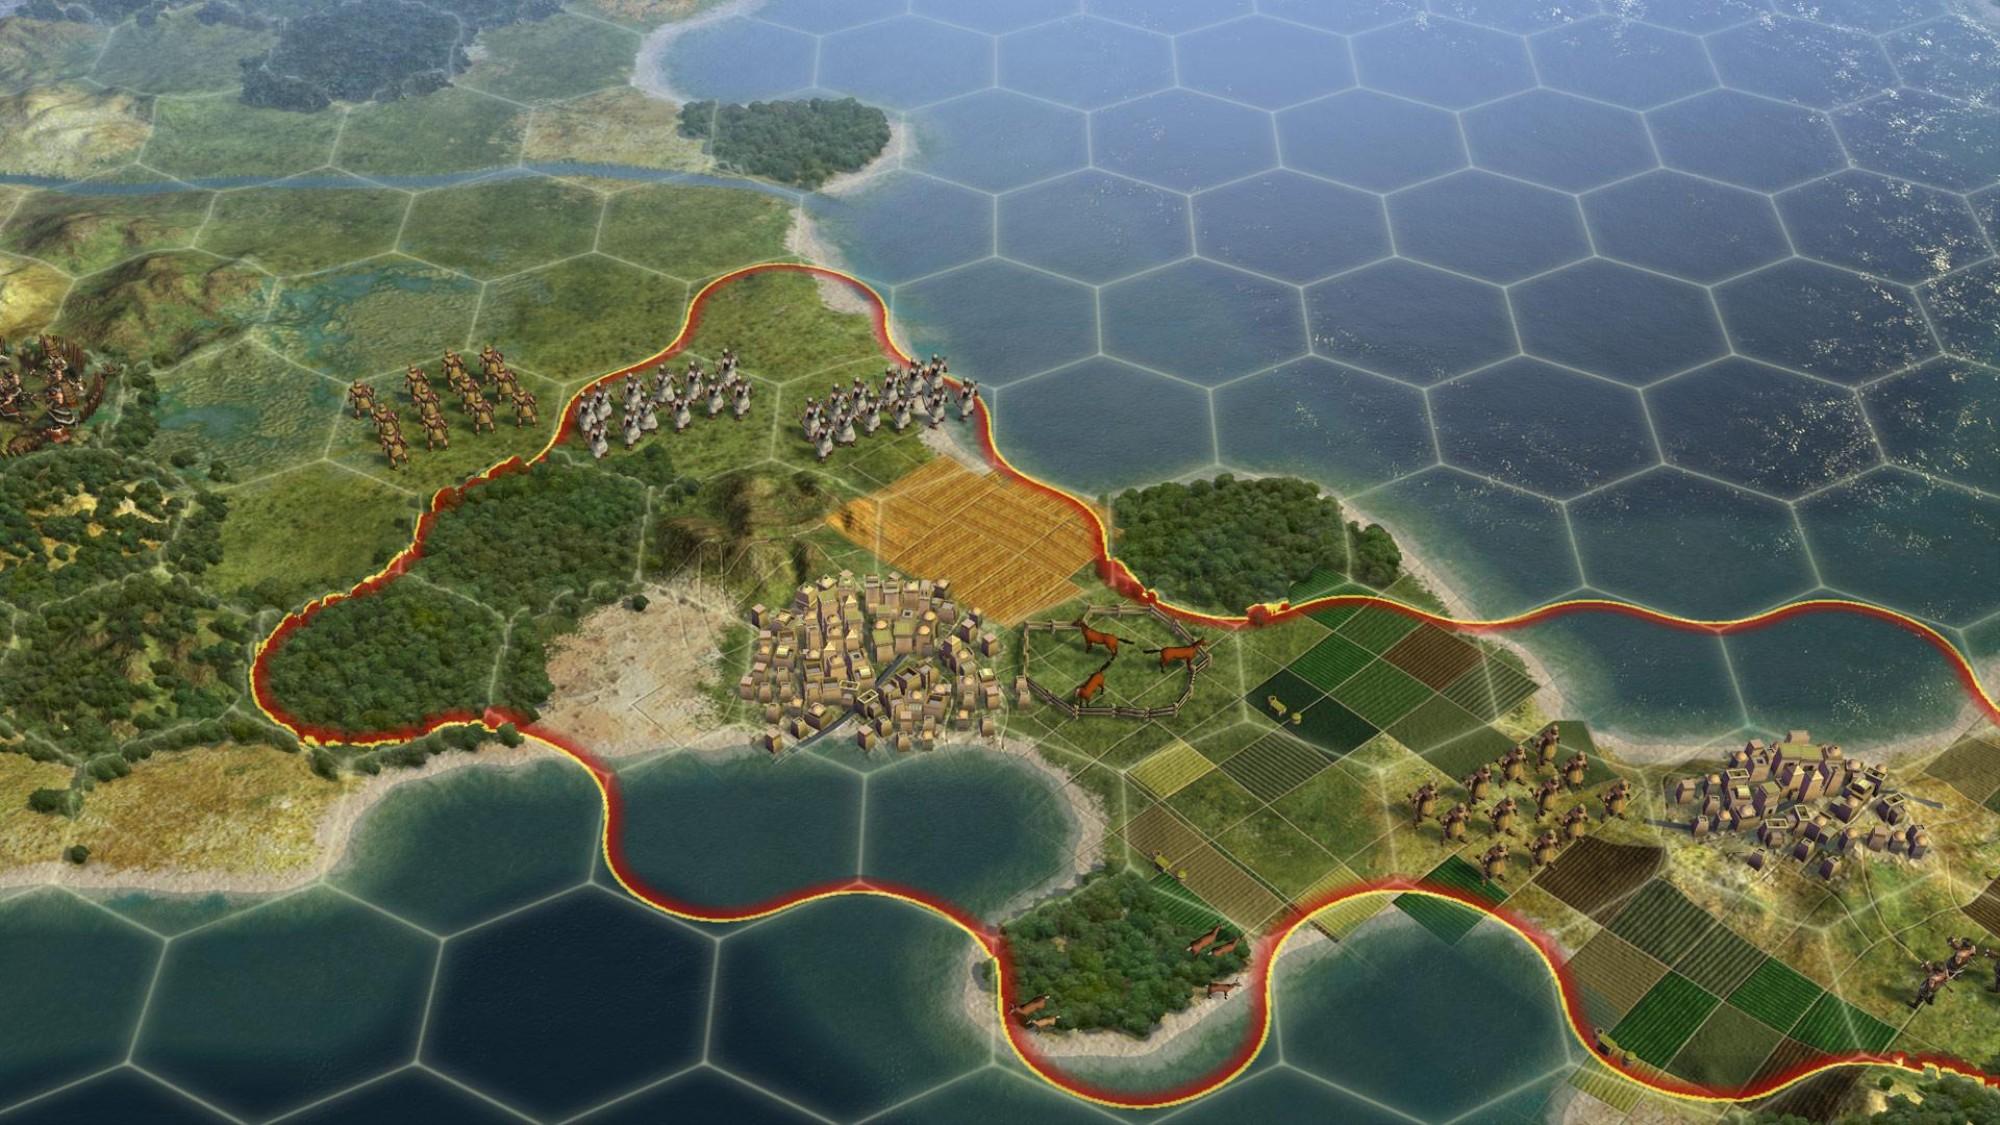 The Modders Who Decided to Overhaul the AI in 'Civilization ... on civ 5 cover, civ 5 huge maps, civ 5 world builder, civ 5 options, civ 5 custom maps, civ 5 gameplay, civ 5 mods, civ 5 terra maps, civ 5 archipelago, civ 5 funny, civ 5 demo, civ 5 multiplayer, civ 5 mini maps, civ 5 hitler, civ 5 tech tree, civ 5 cheats, civ 5 washington, civ 5 screenshots, civ 5 icons, civ 5 gandhi,